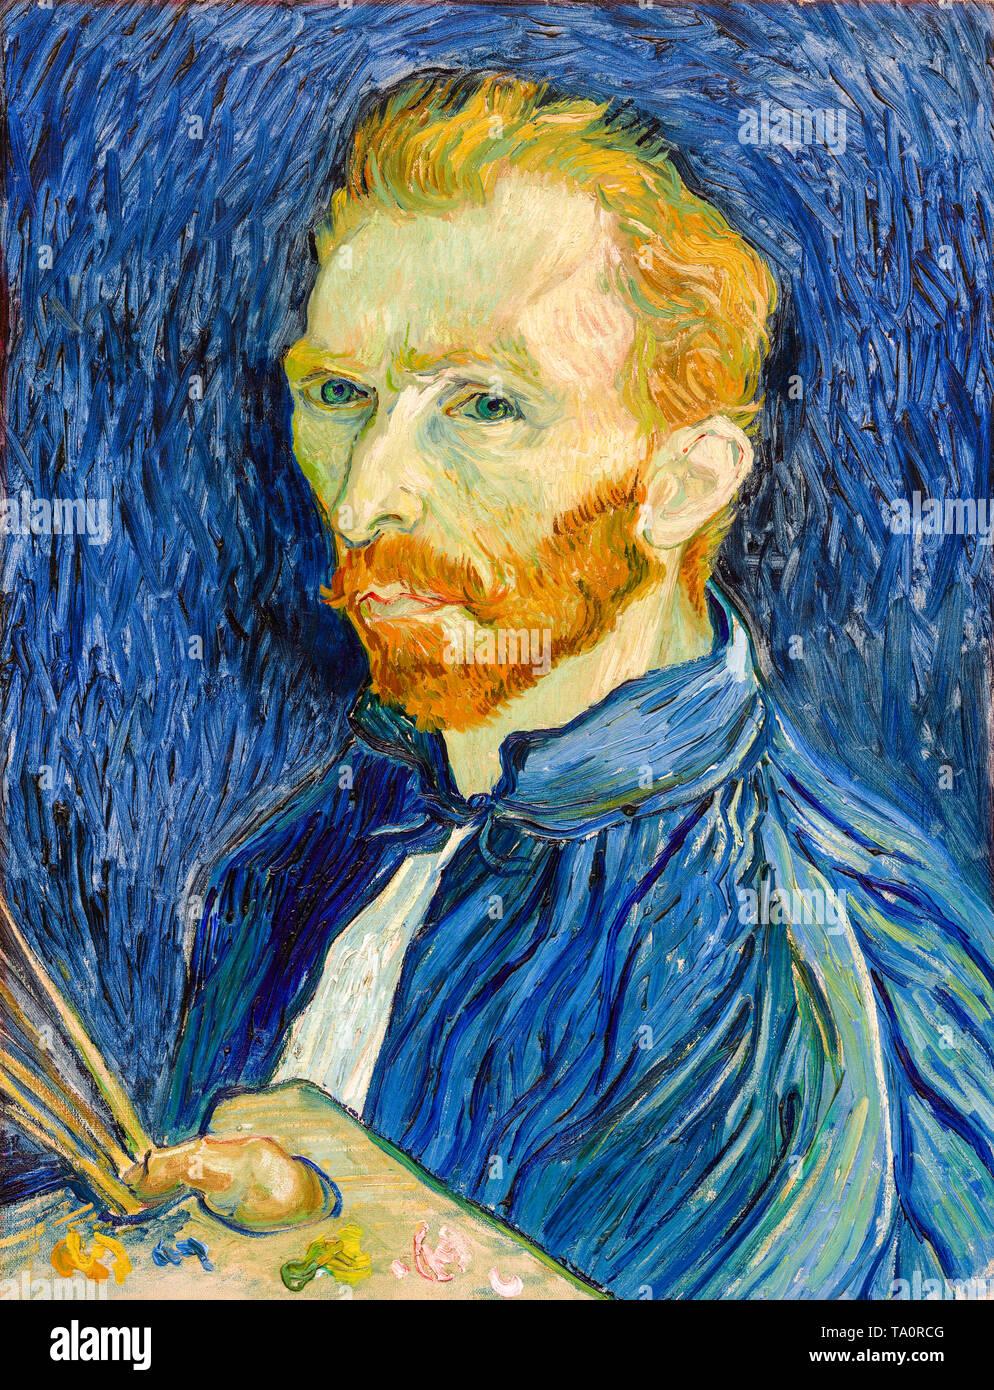 Self Portrait of Vincent van Gogh, 1889 - Stock Image